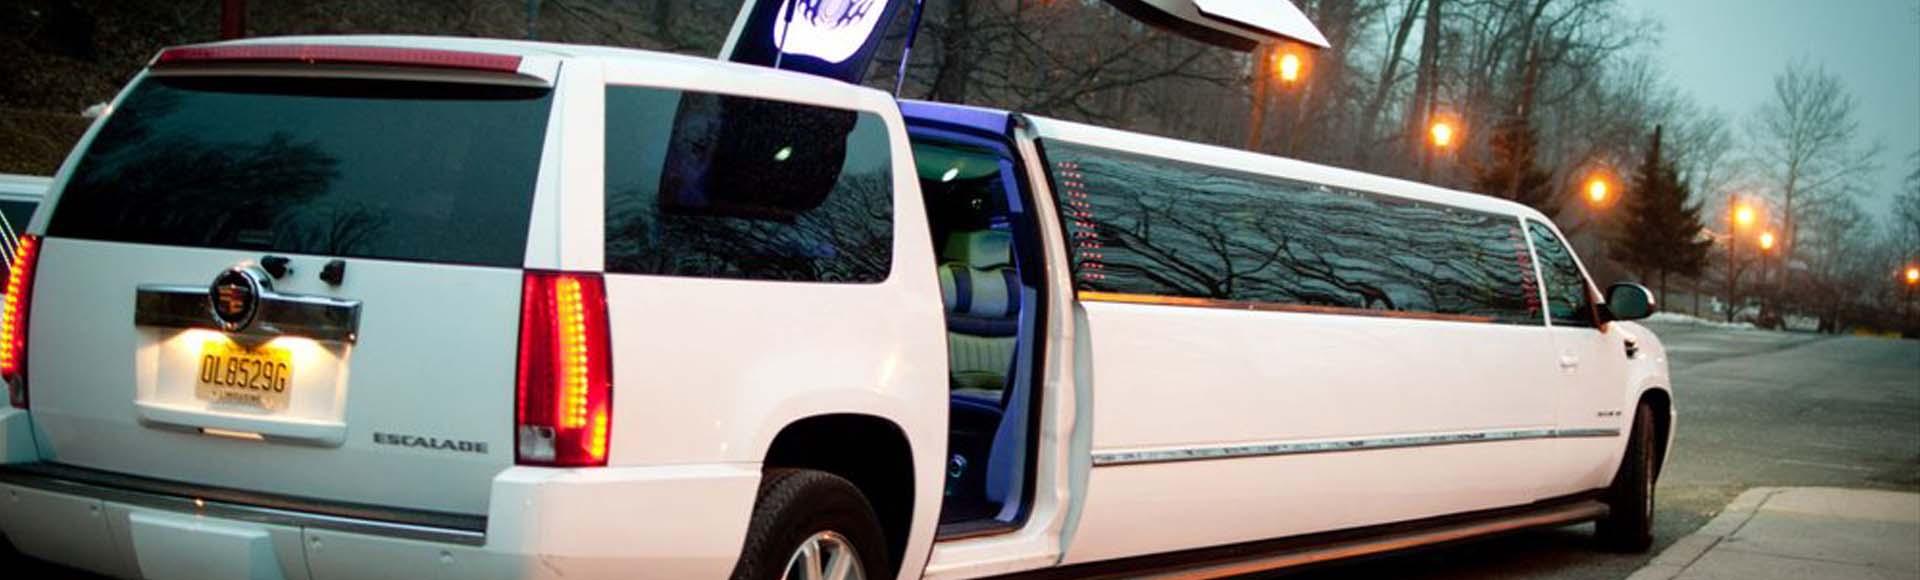 Hartford Airport Rental Car Paylerss